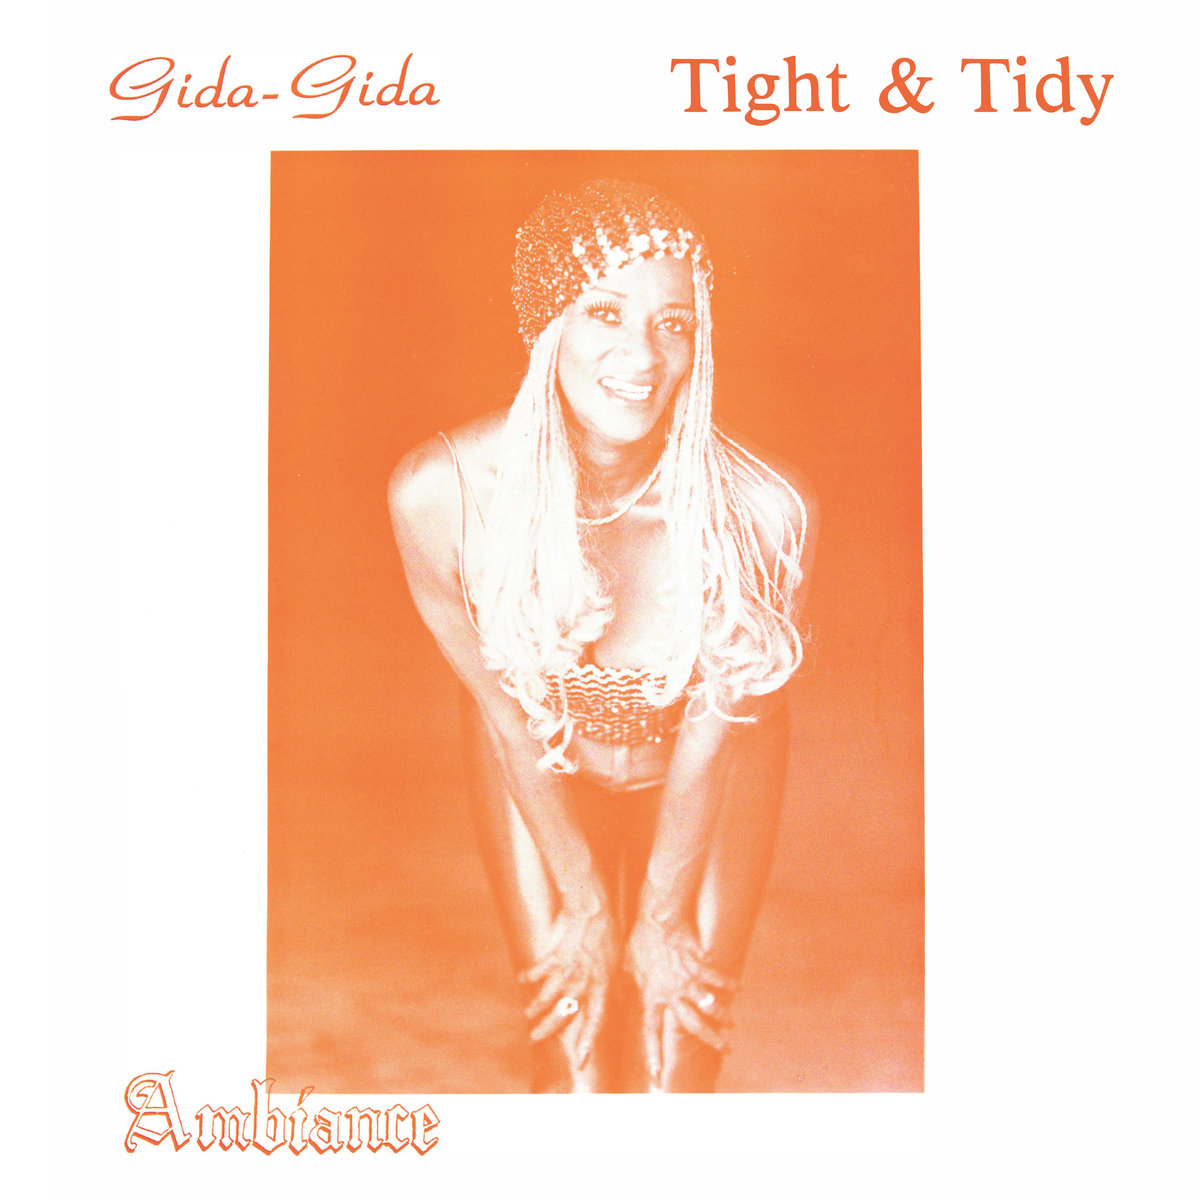 Ambiance - (Gida-Gida) Tight & Tidy